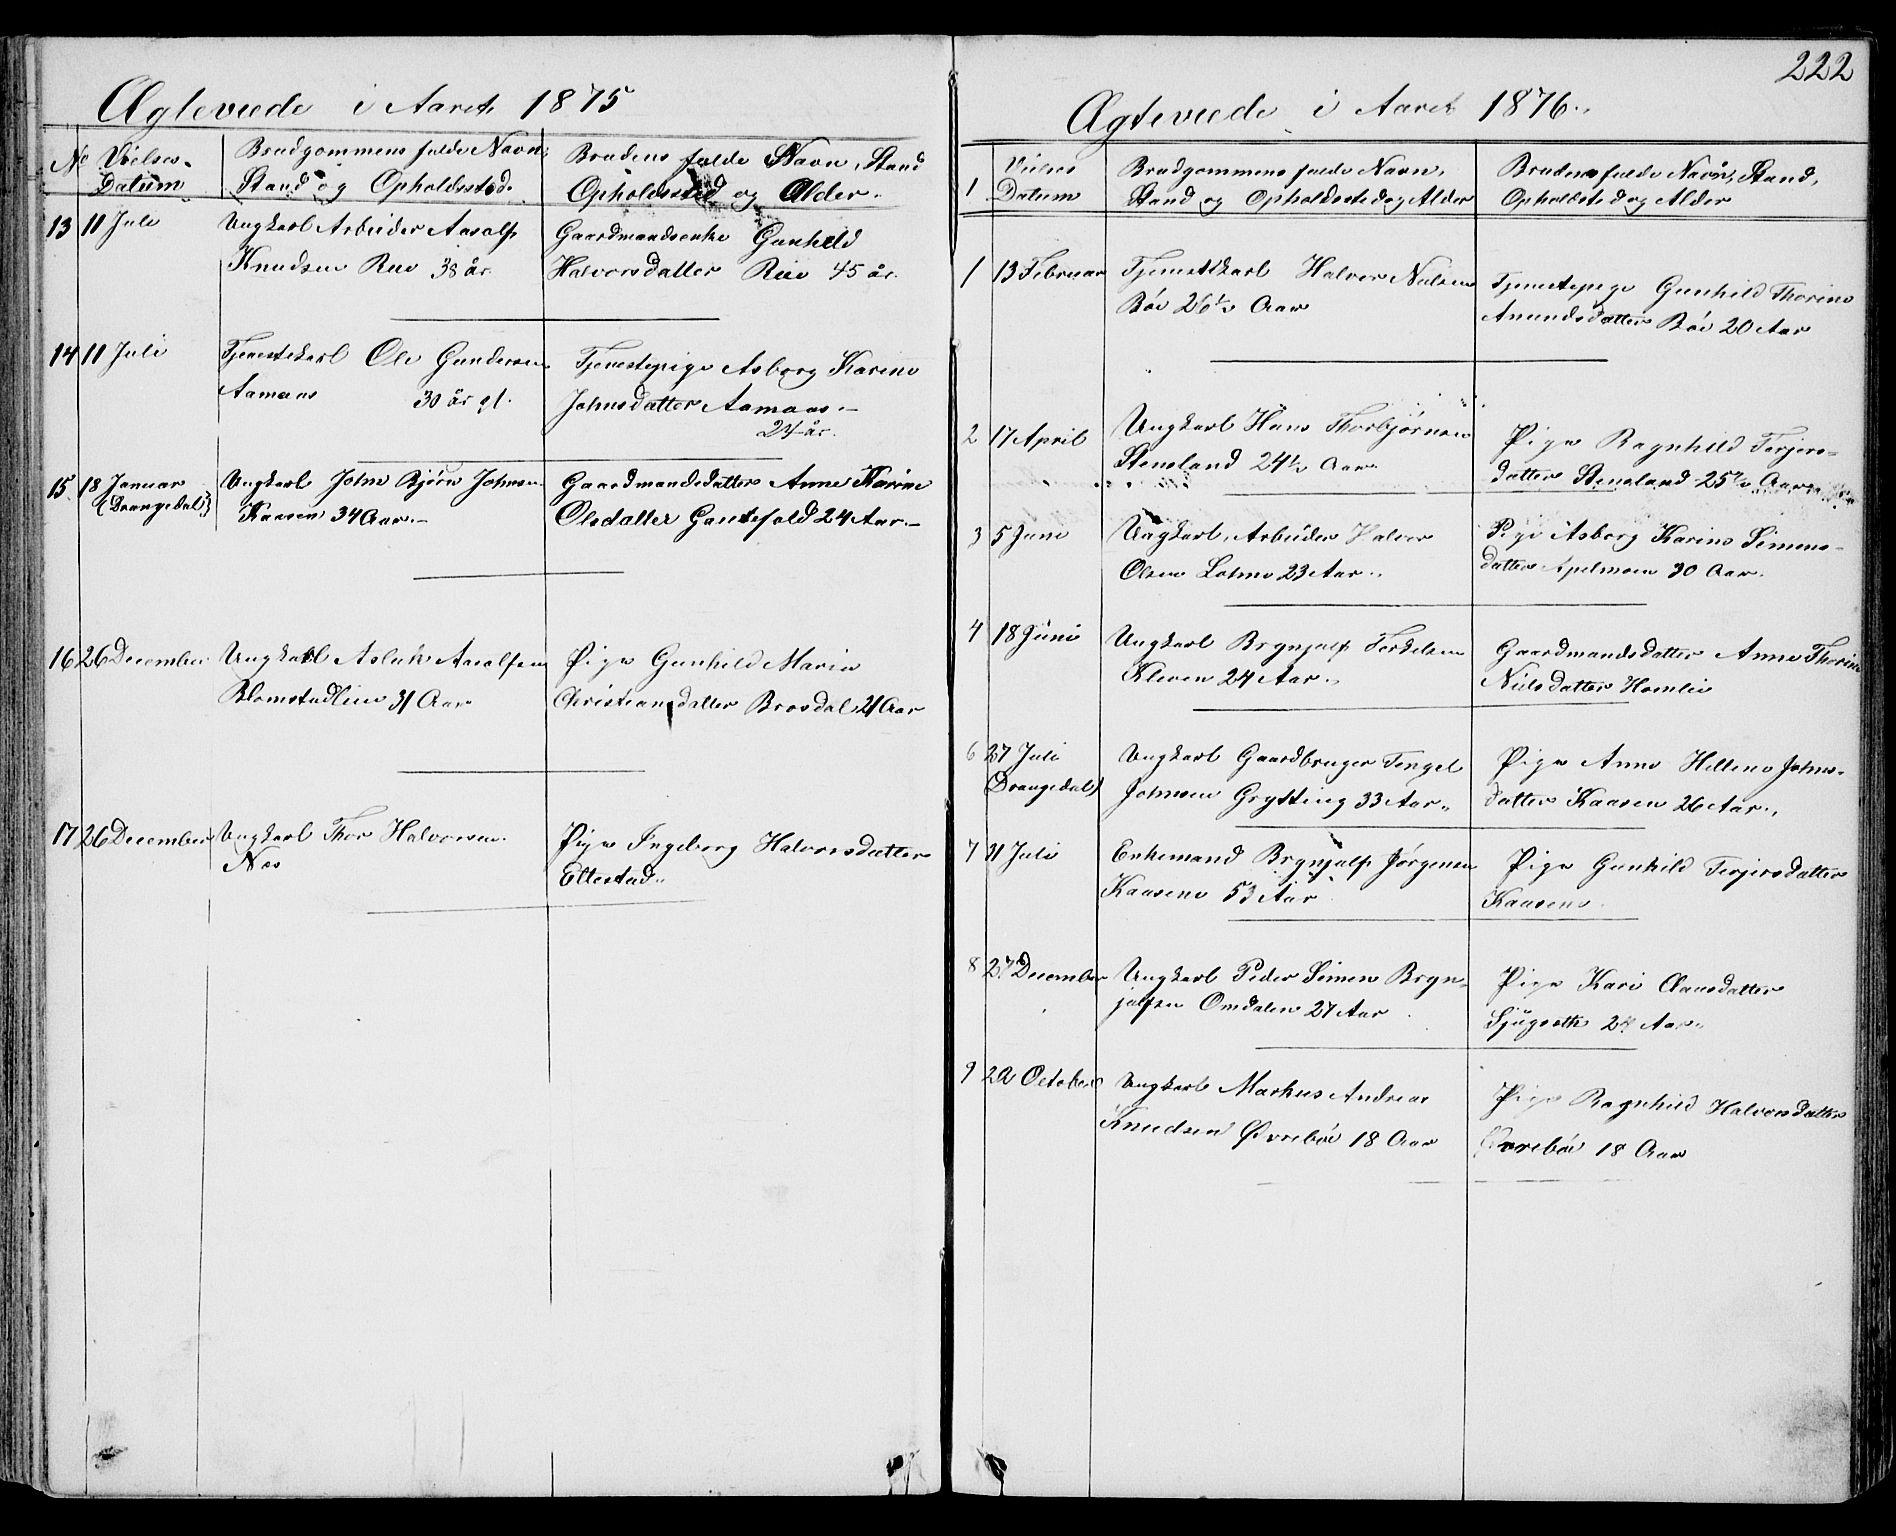 SAKO, Drangedal kirkebøker, G/Gb/L0001: Klokkerbok nr. II 1, 1856-1894, s. 222